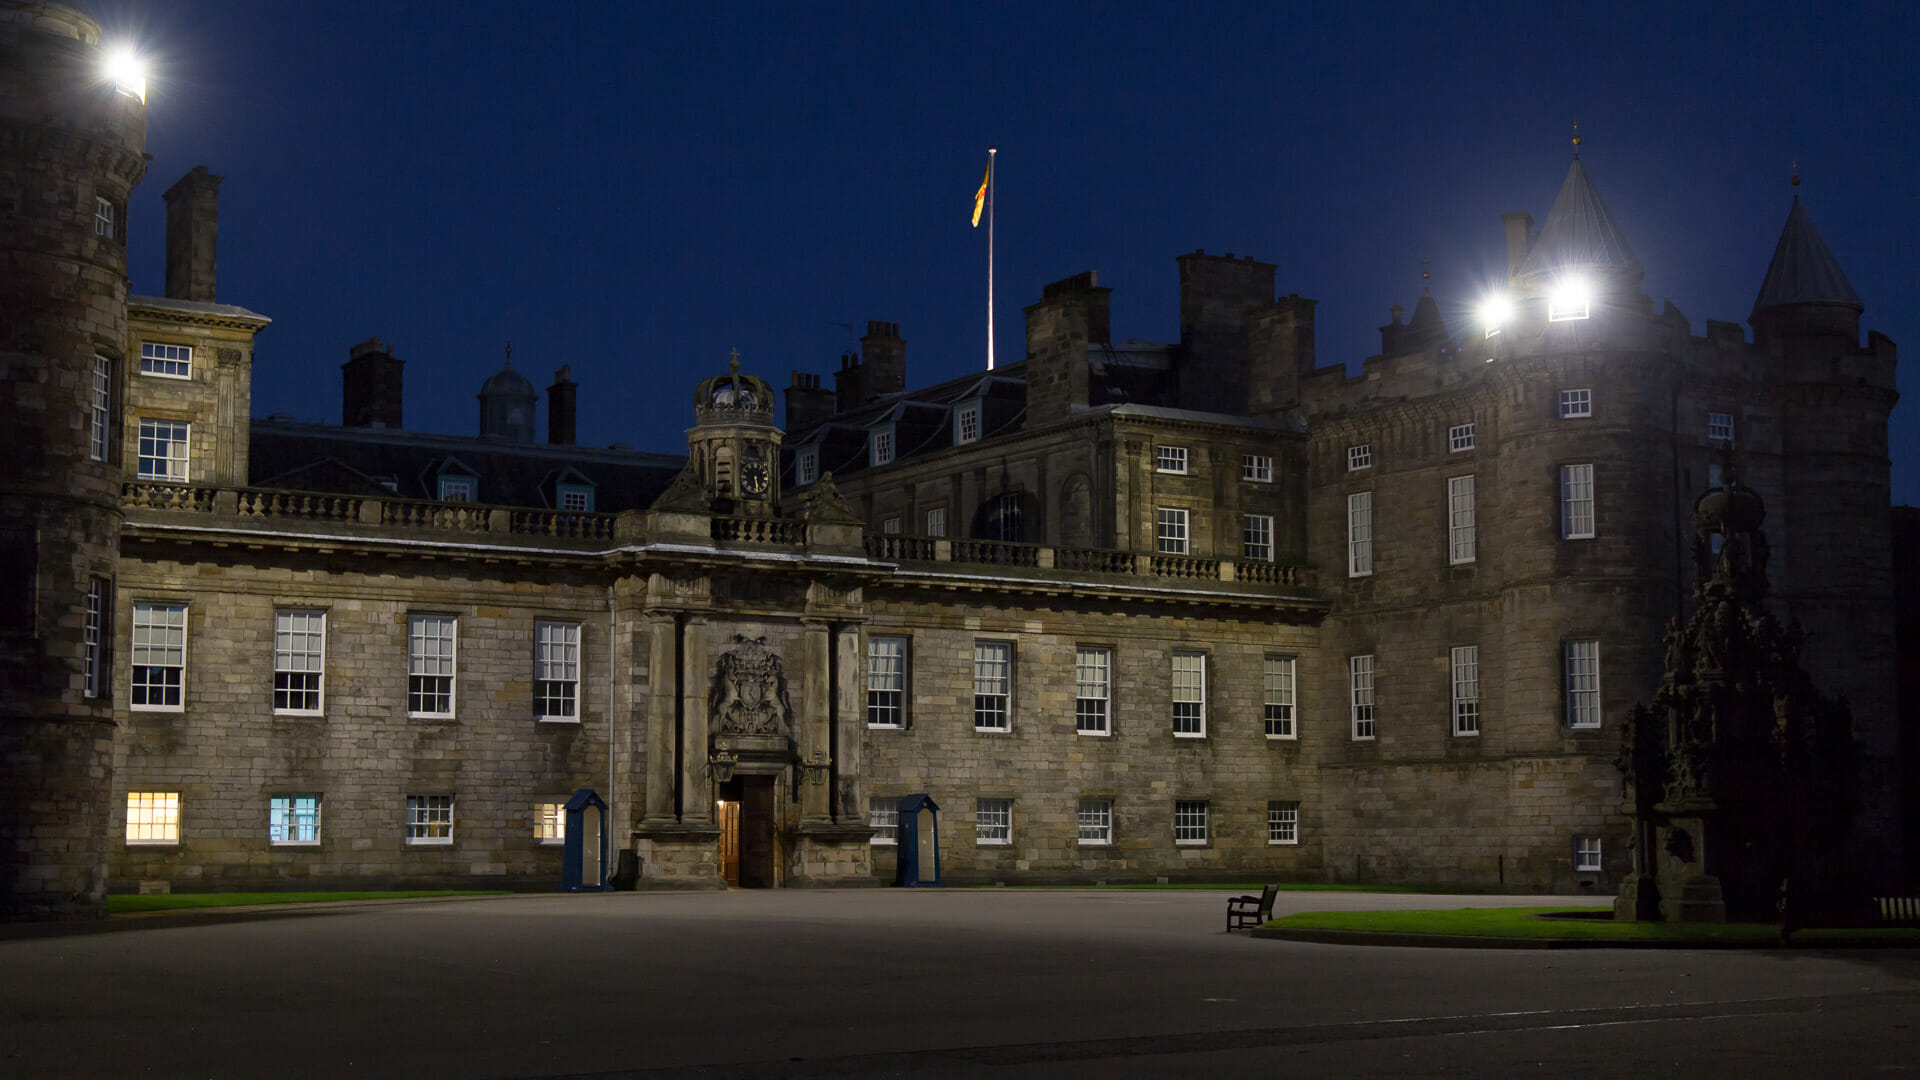 Der Hollyrood Palace ist nachts hell erleuchtet